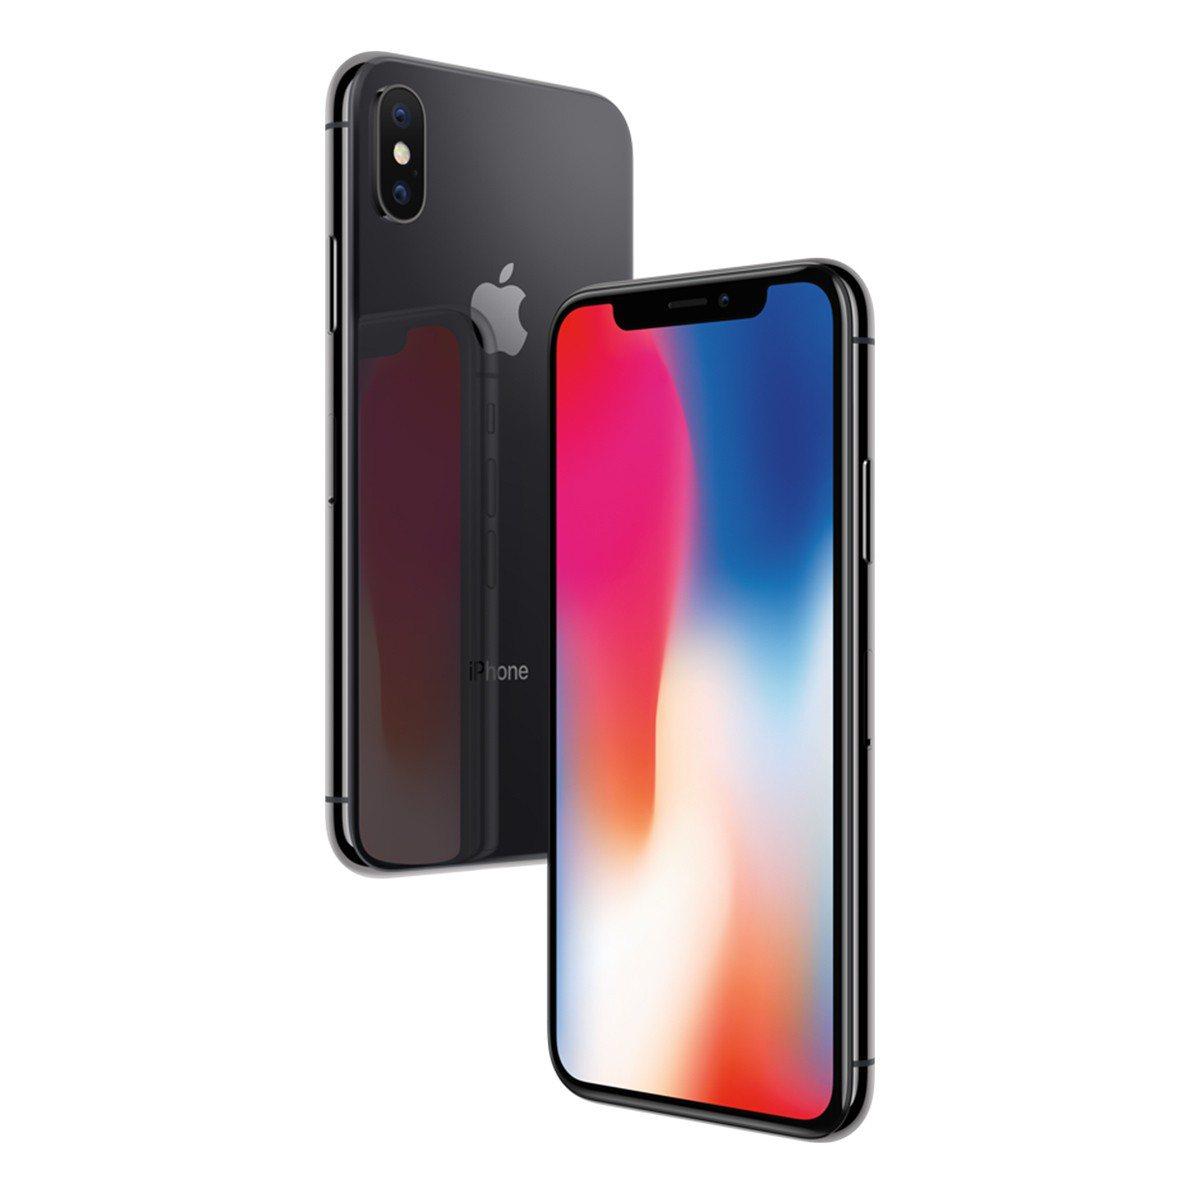 iPhone X 256GB原價41,500元、PChome24h購物年中慶特價...